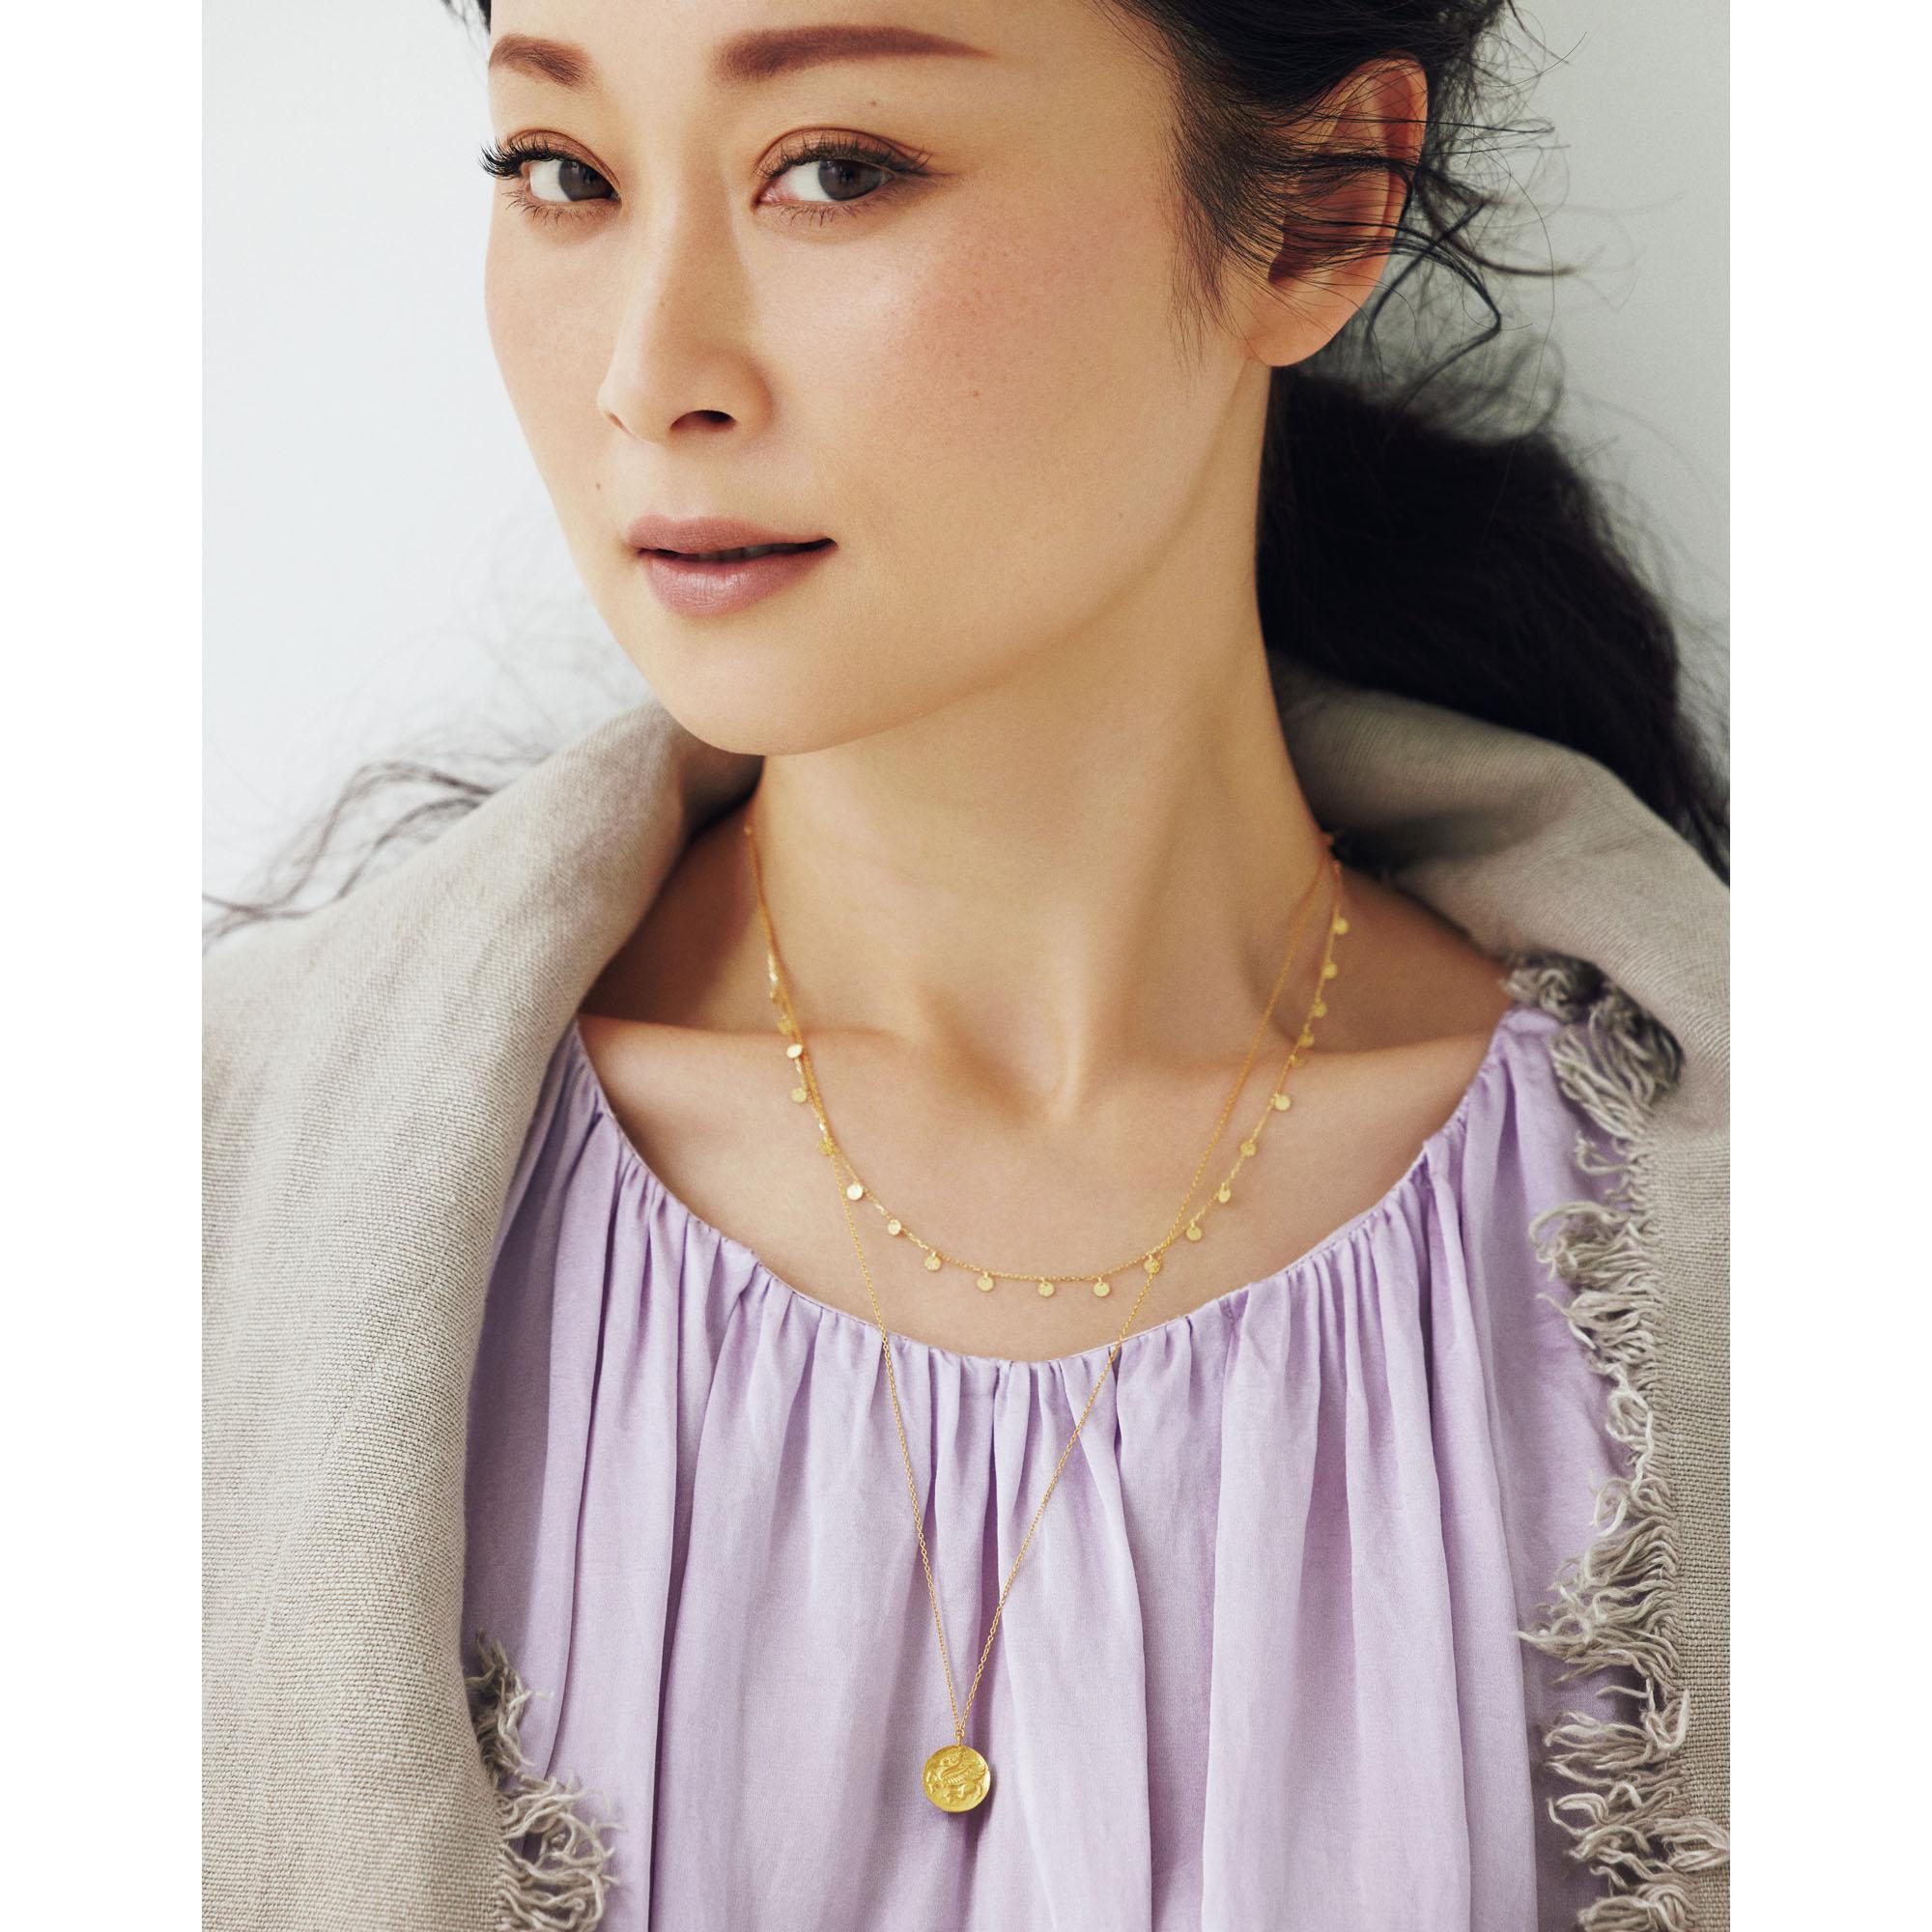 【LEE DAYS掲載】スペシャル別注企画 #1 モデル・デザイナー雅姫さん×マリハ